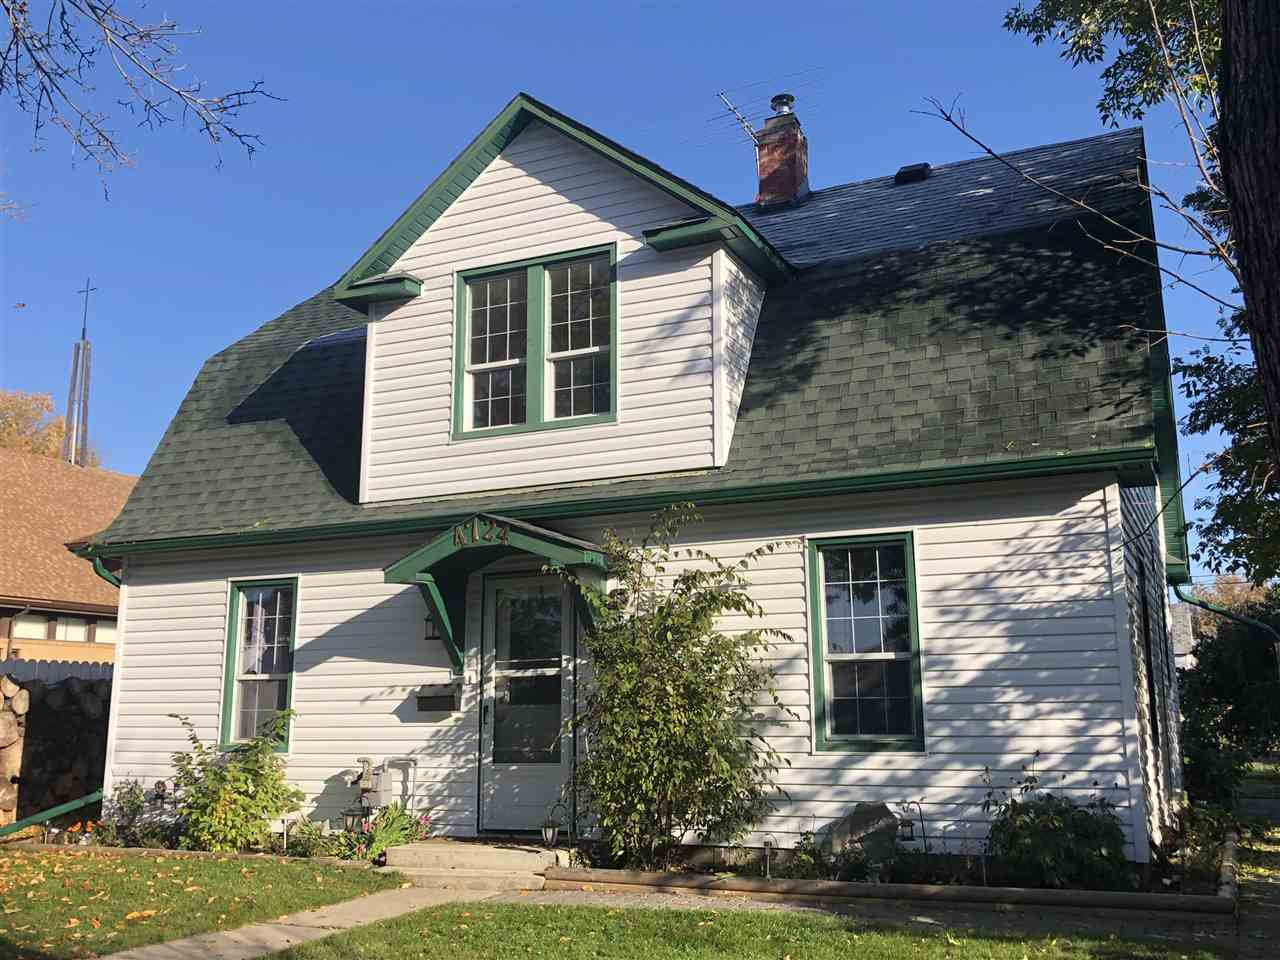 Main Photo: 4724 51 Avenue: Wetaskiwin House for sale : MLS®# E4189763